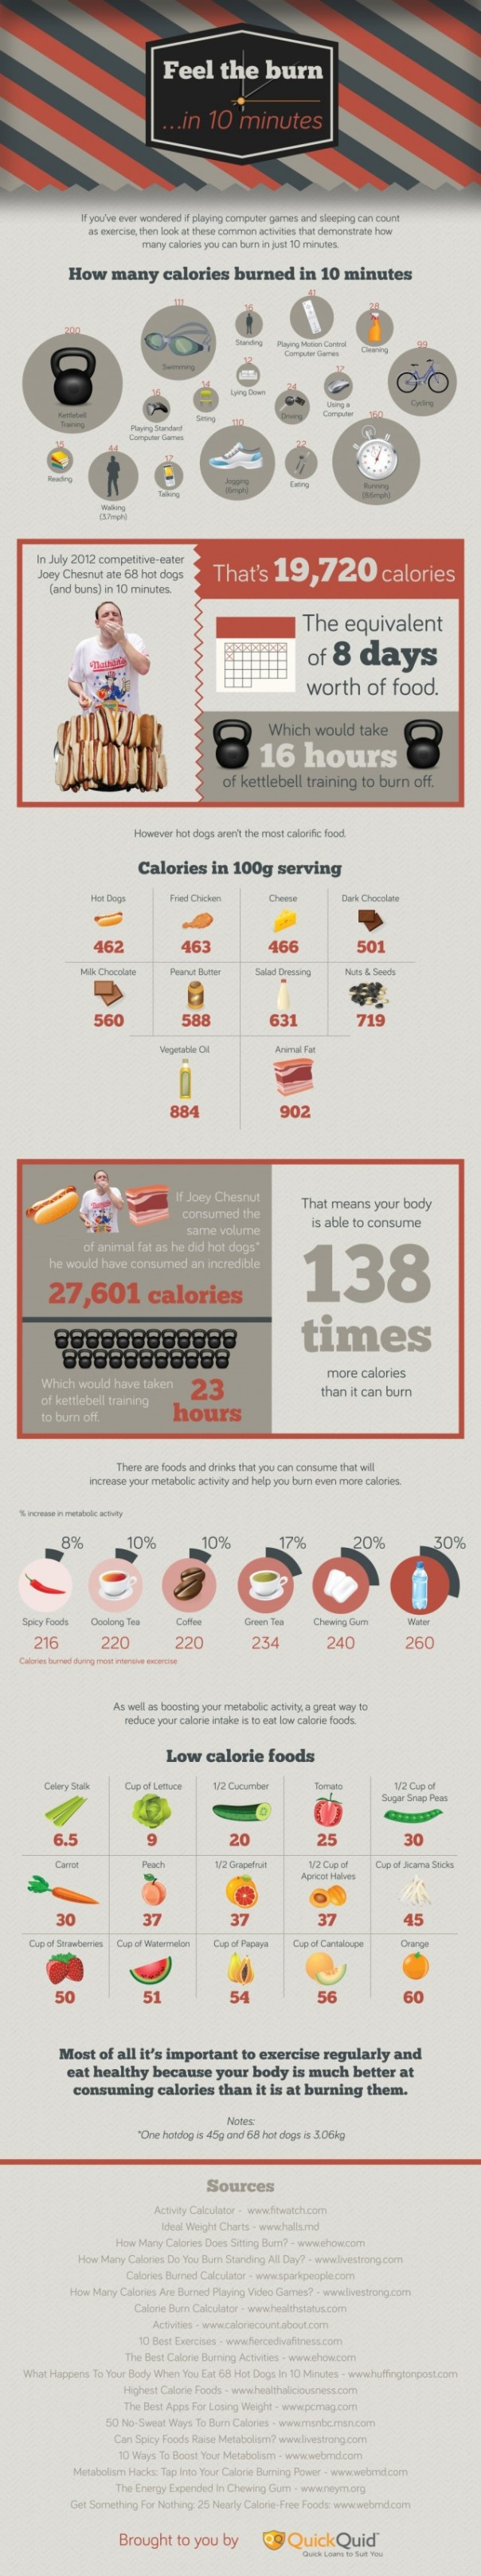 Infographic Tanesha White